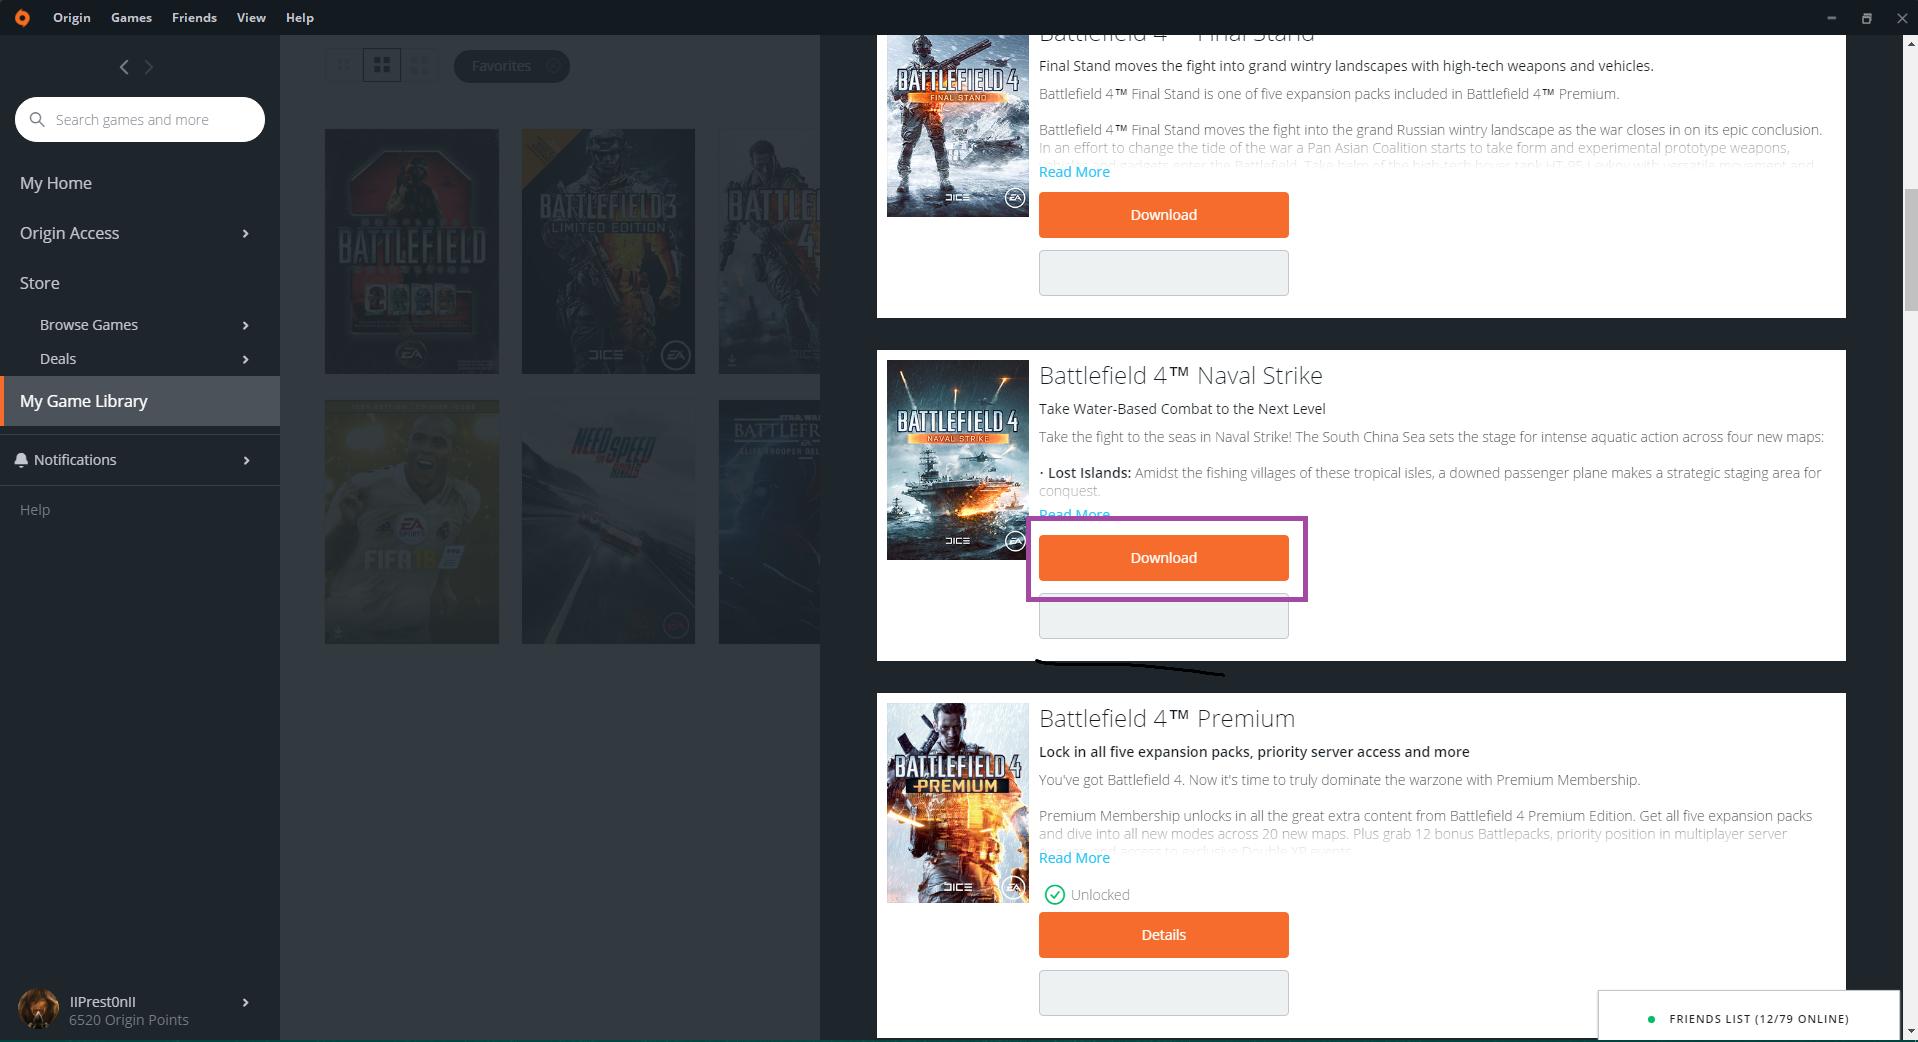 Can't download a DLC — Battlefield Forums